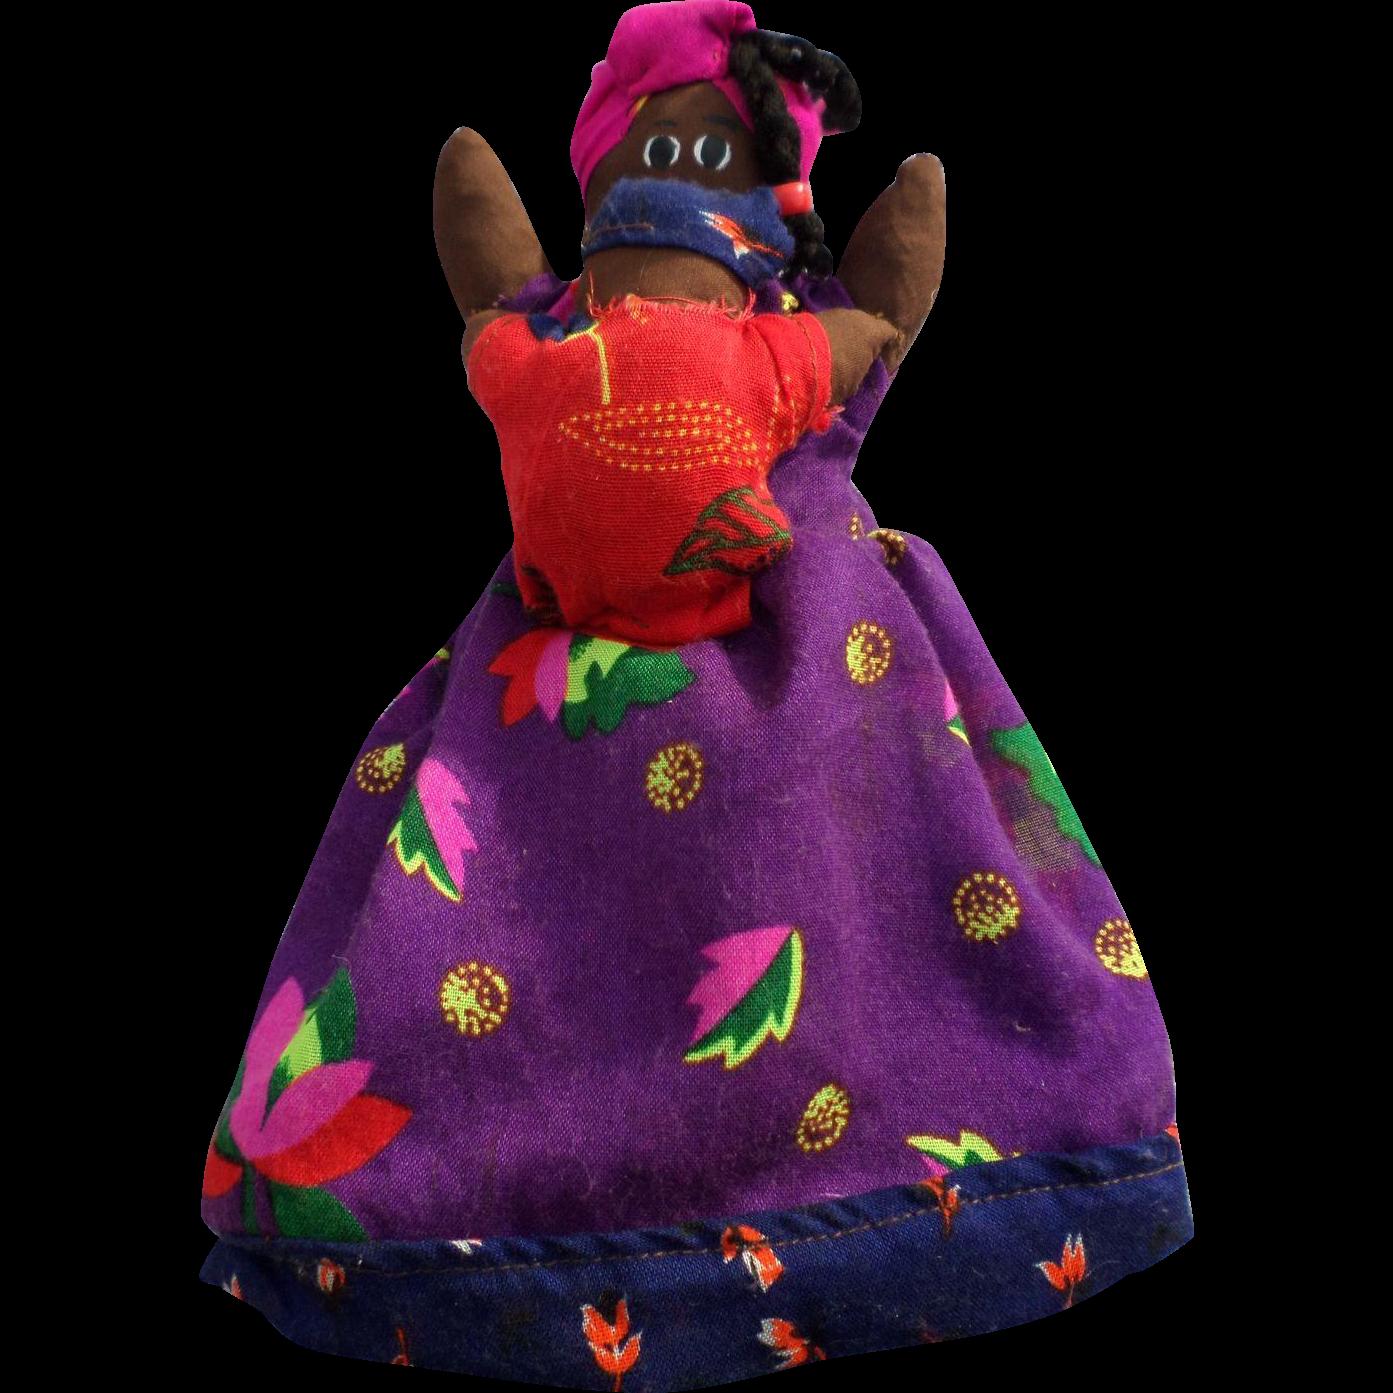 Handmade Black Americana Topsy Turvy Doll